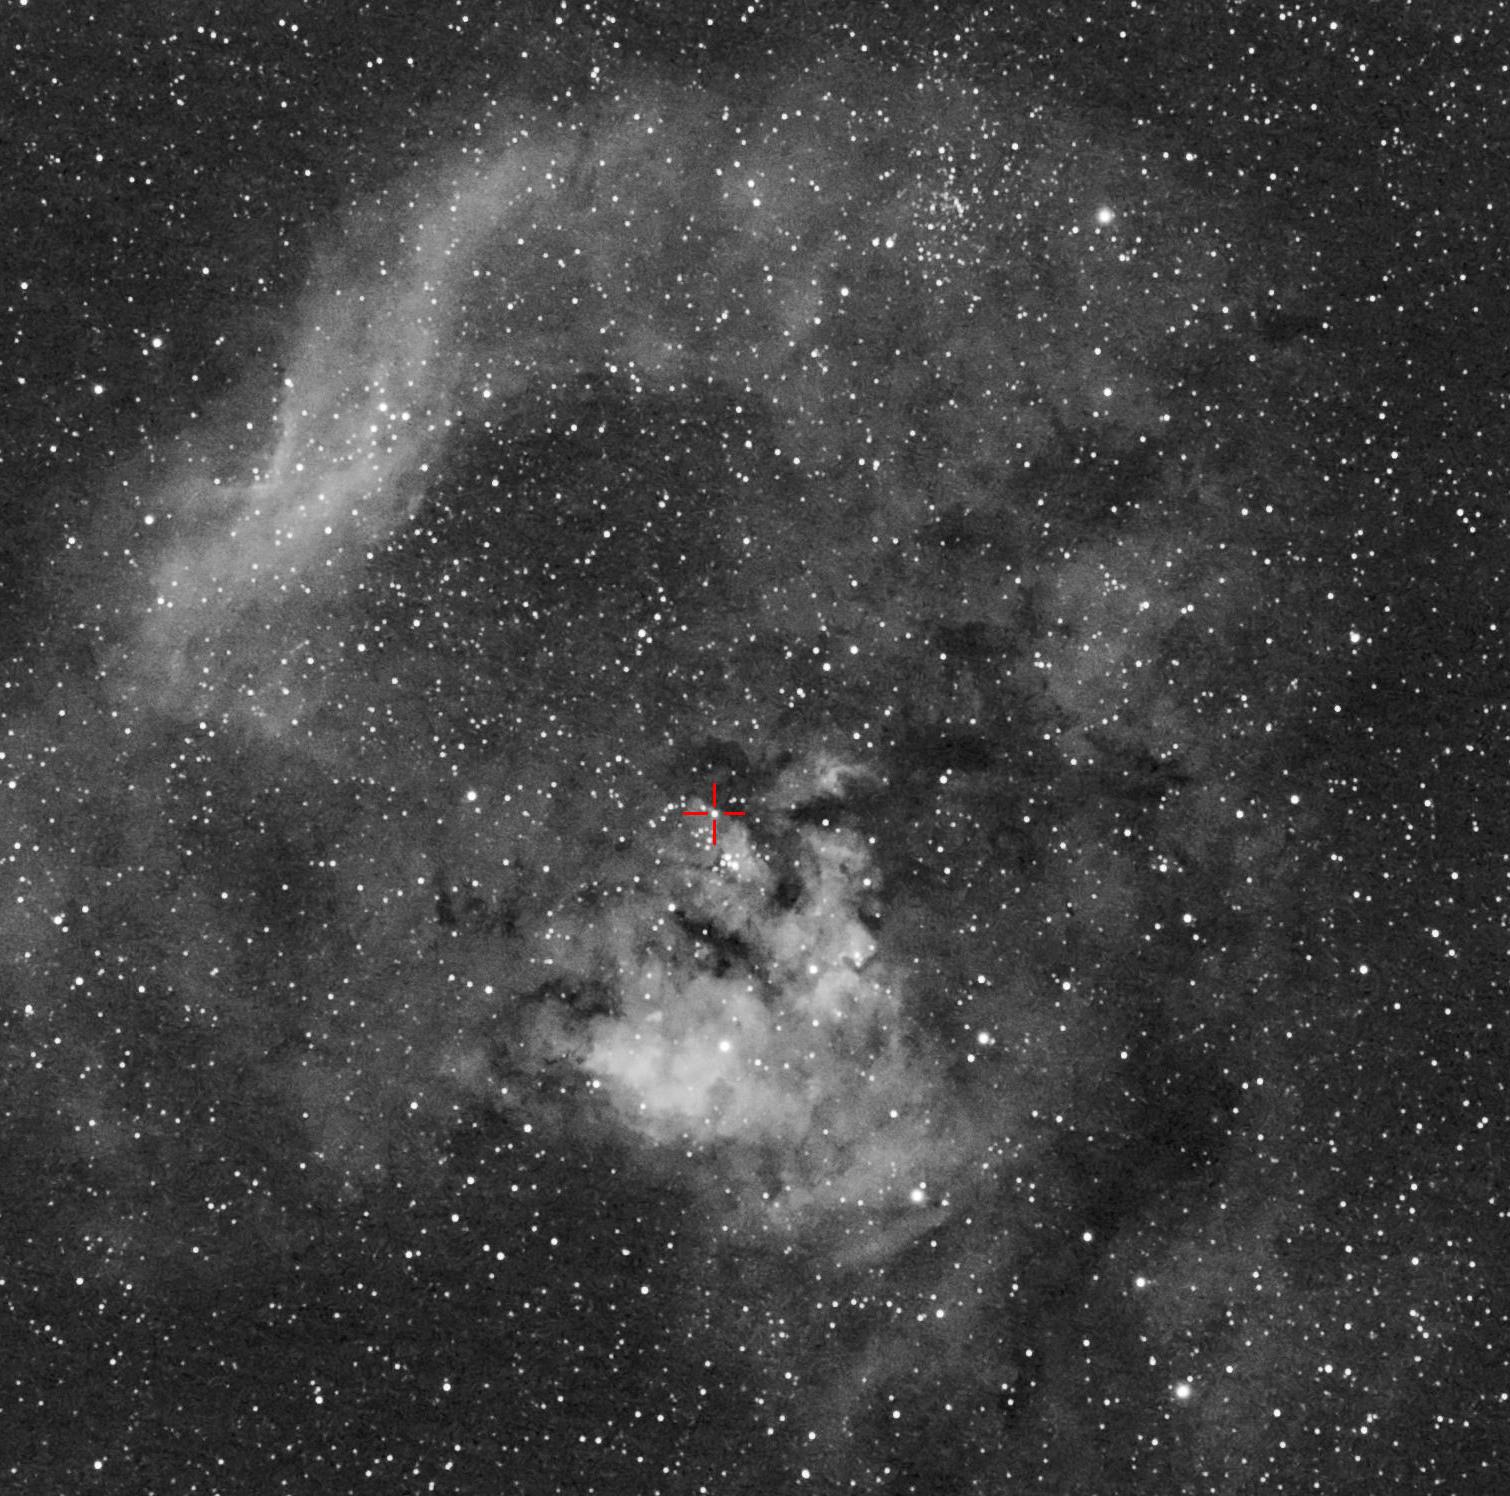 large_star.jpg.a3582b5d8bbfd09f786e8af4c6cb64f5.jpg